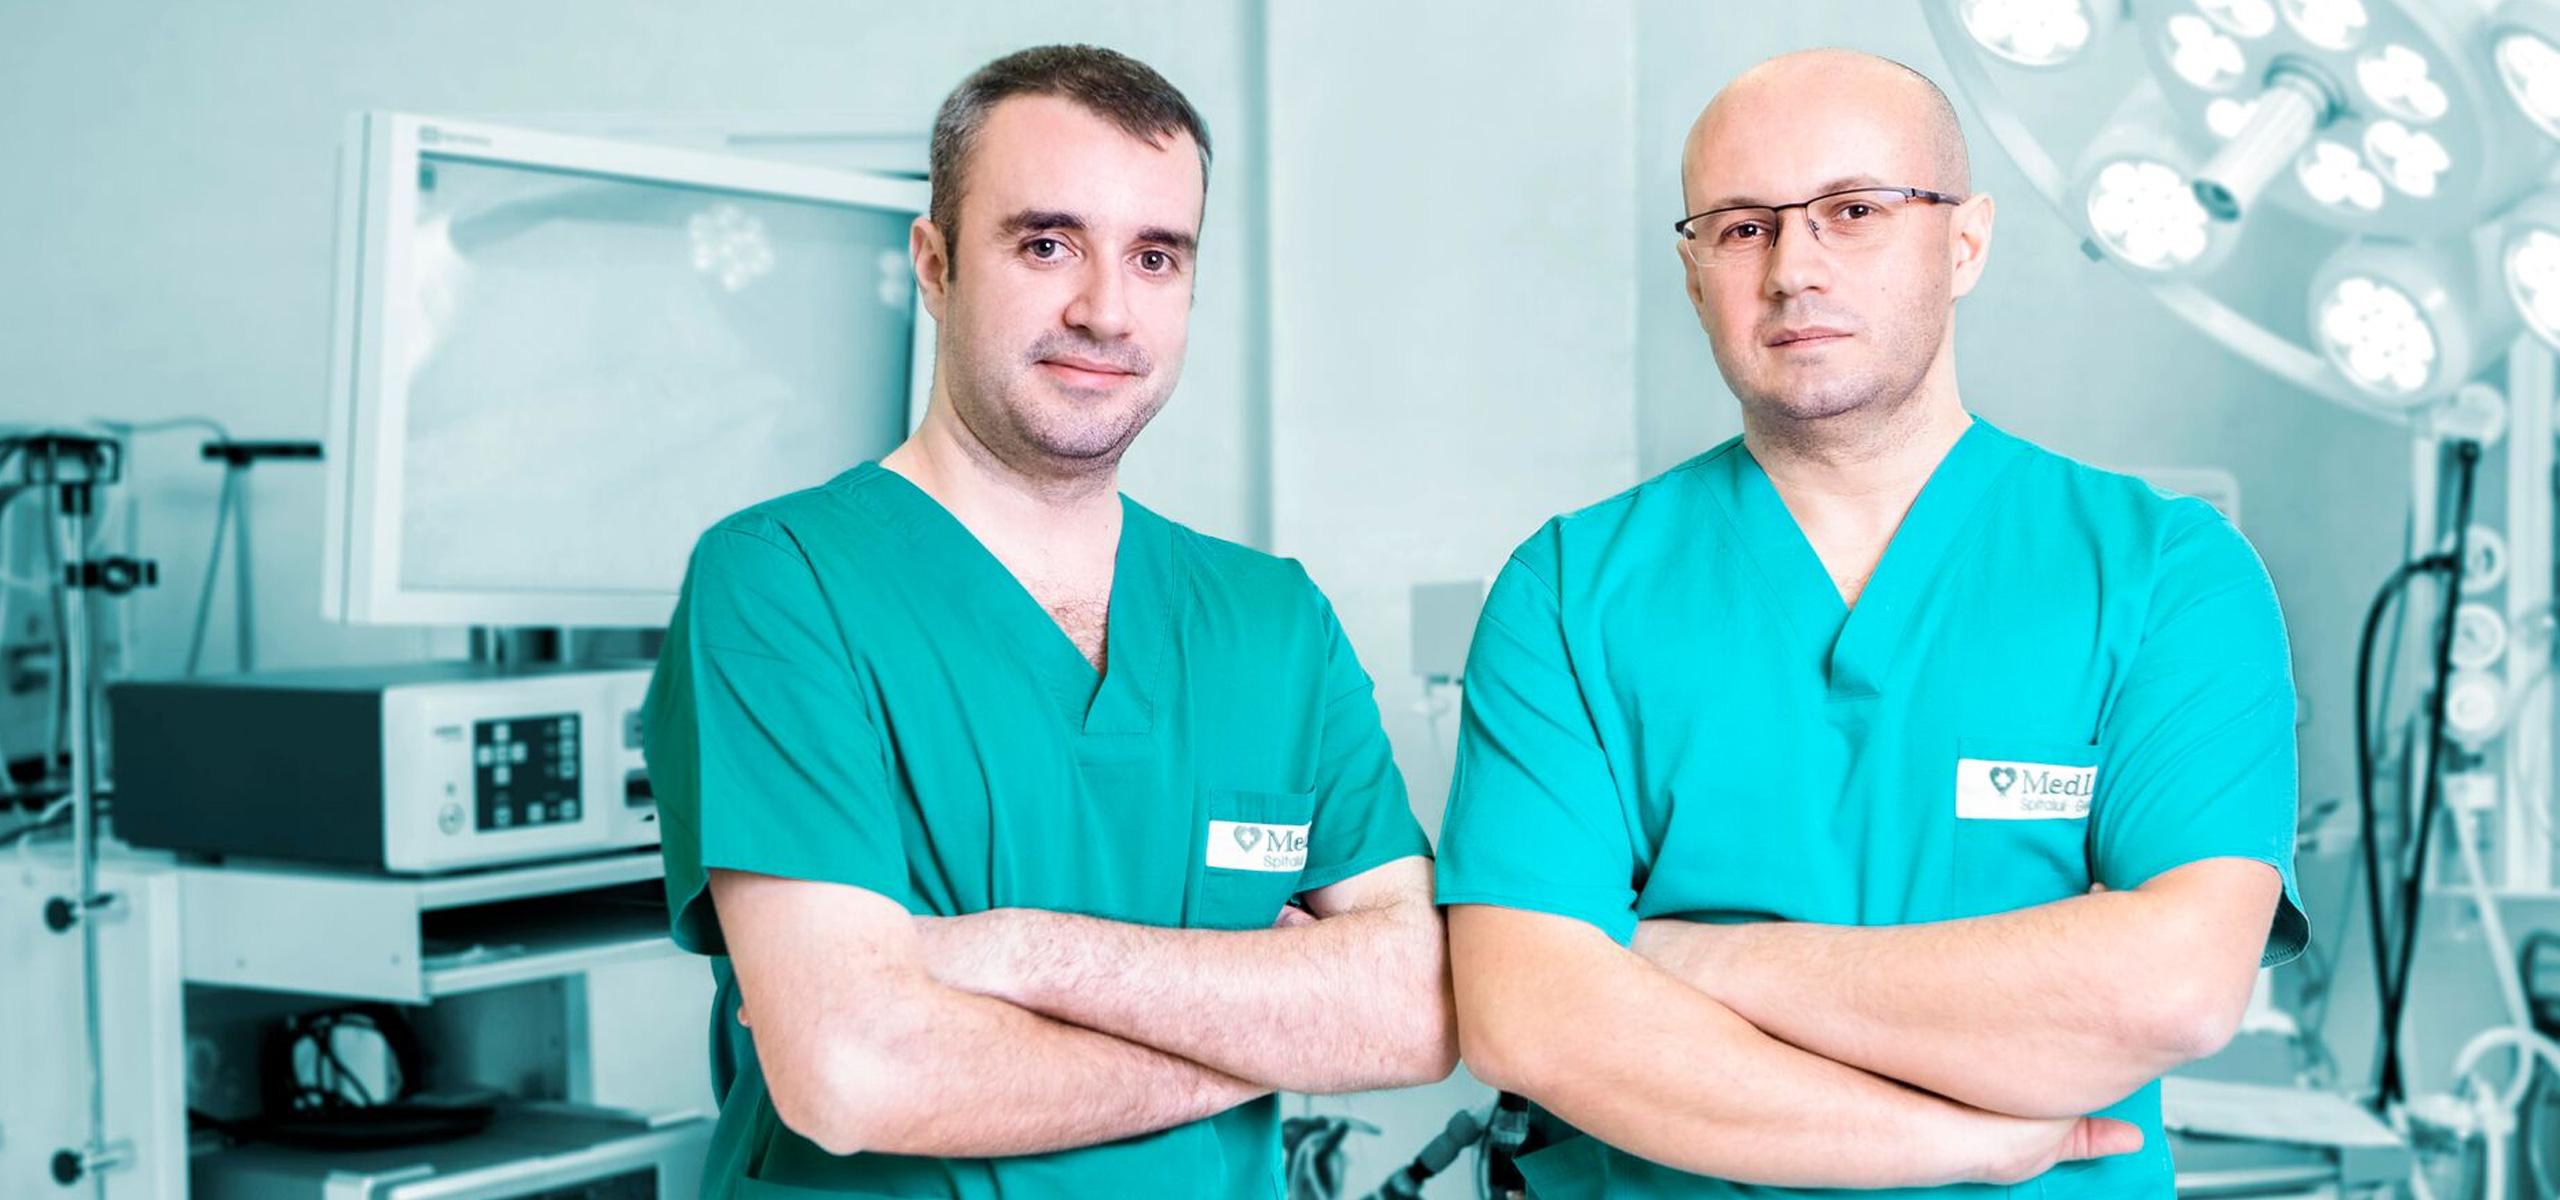 Premiera Chirurgiala MedLife Genesys